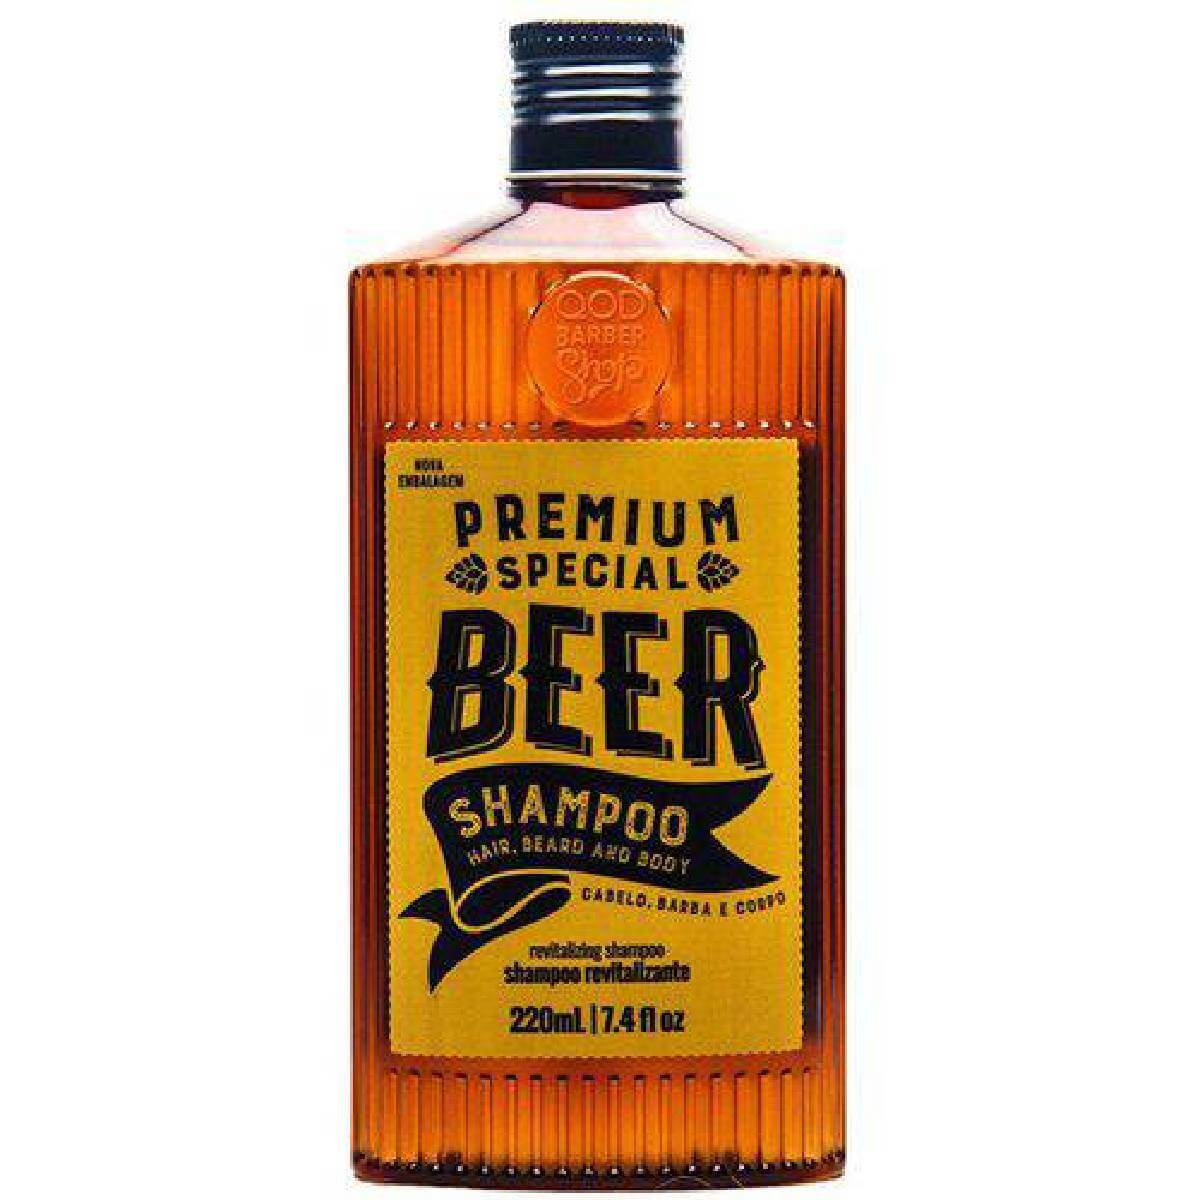 Shampoo QOD Premium Special Beer 220ml